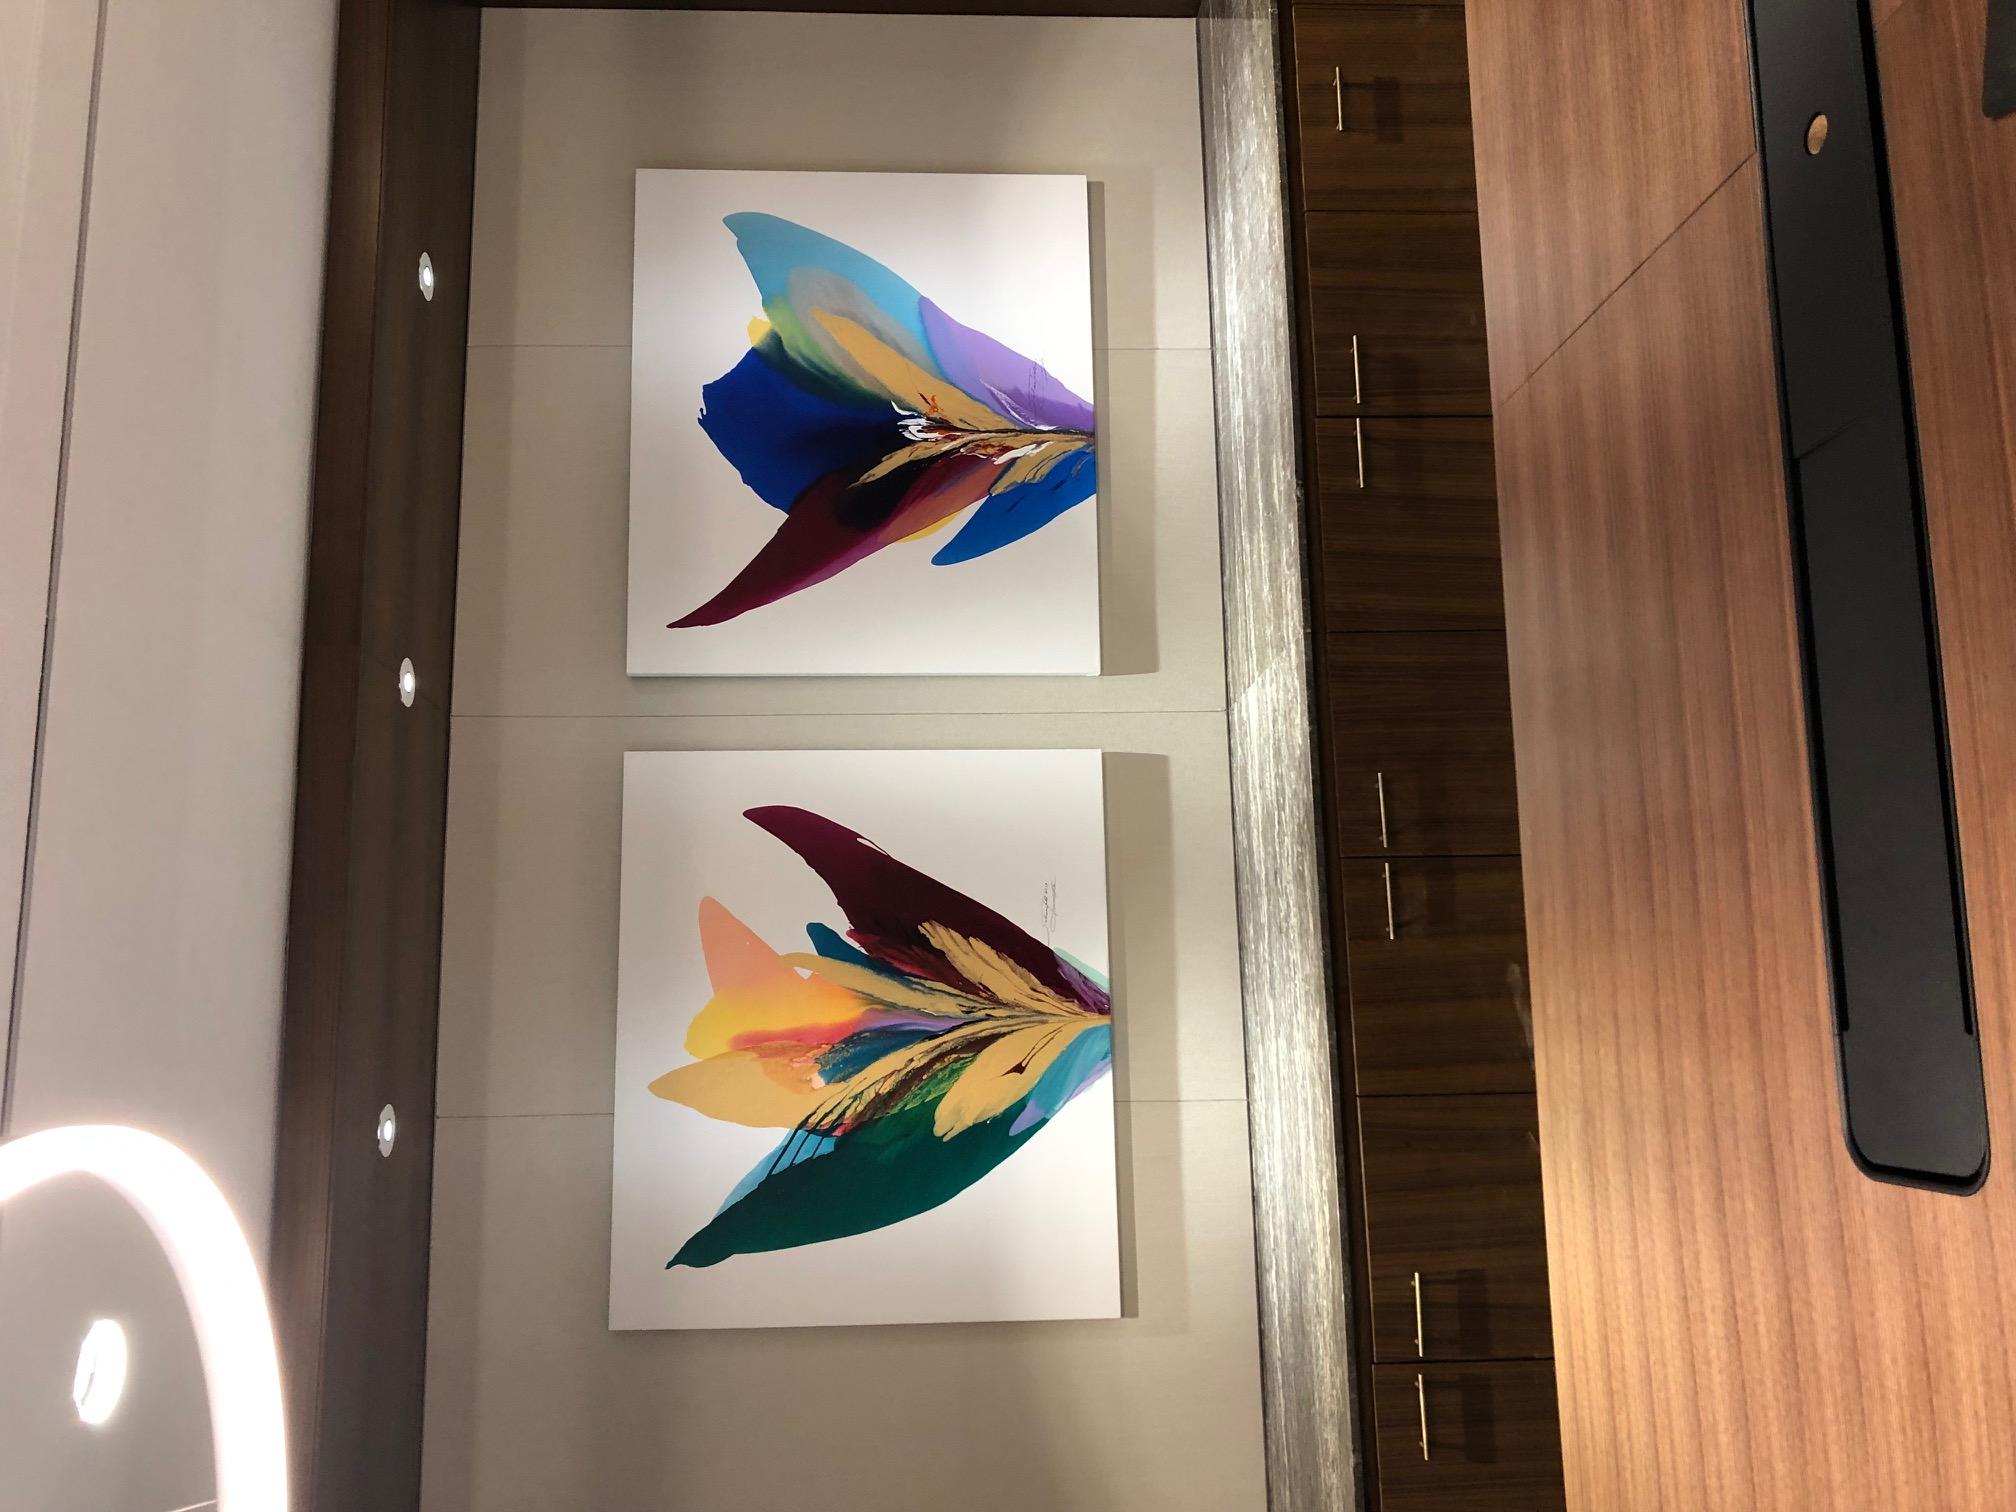 Art For Wells Fargo Corperate Office #1.